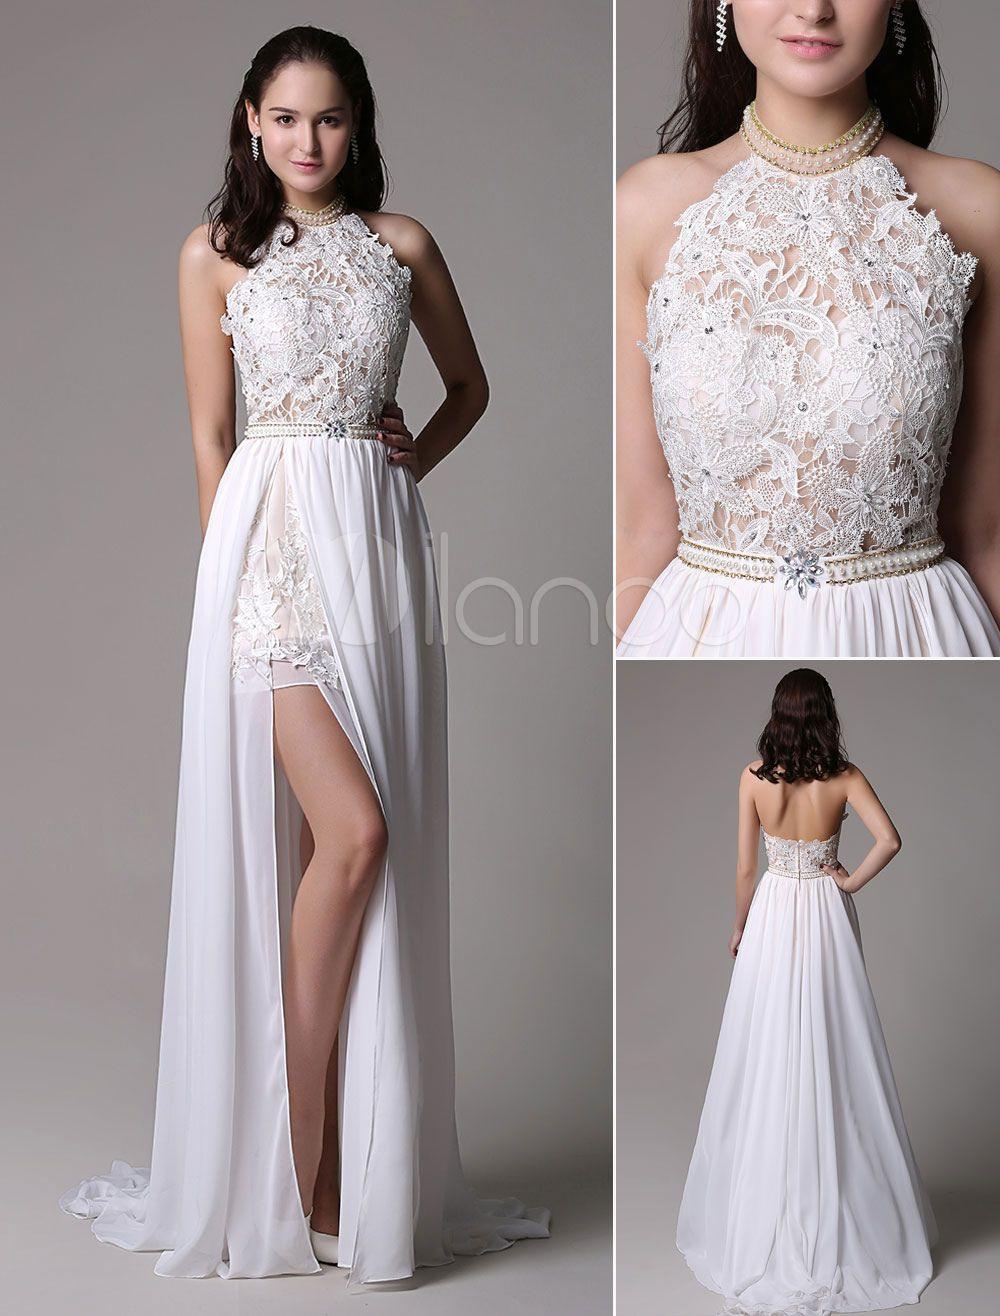 Designer Genial Abend Kleid Elegant GalerieFormal Genial Abend Kleid Elegant Stylish